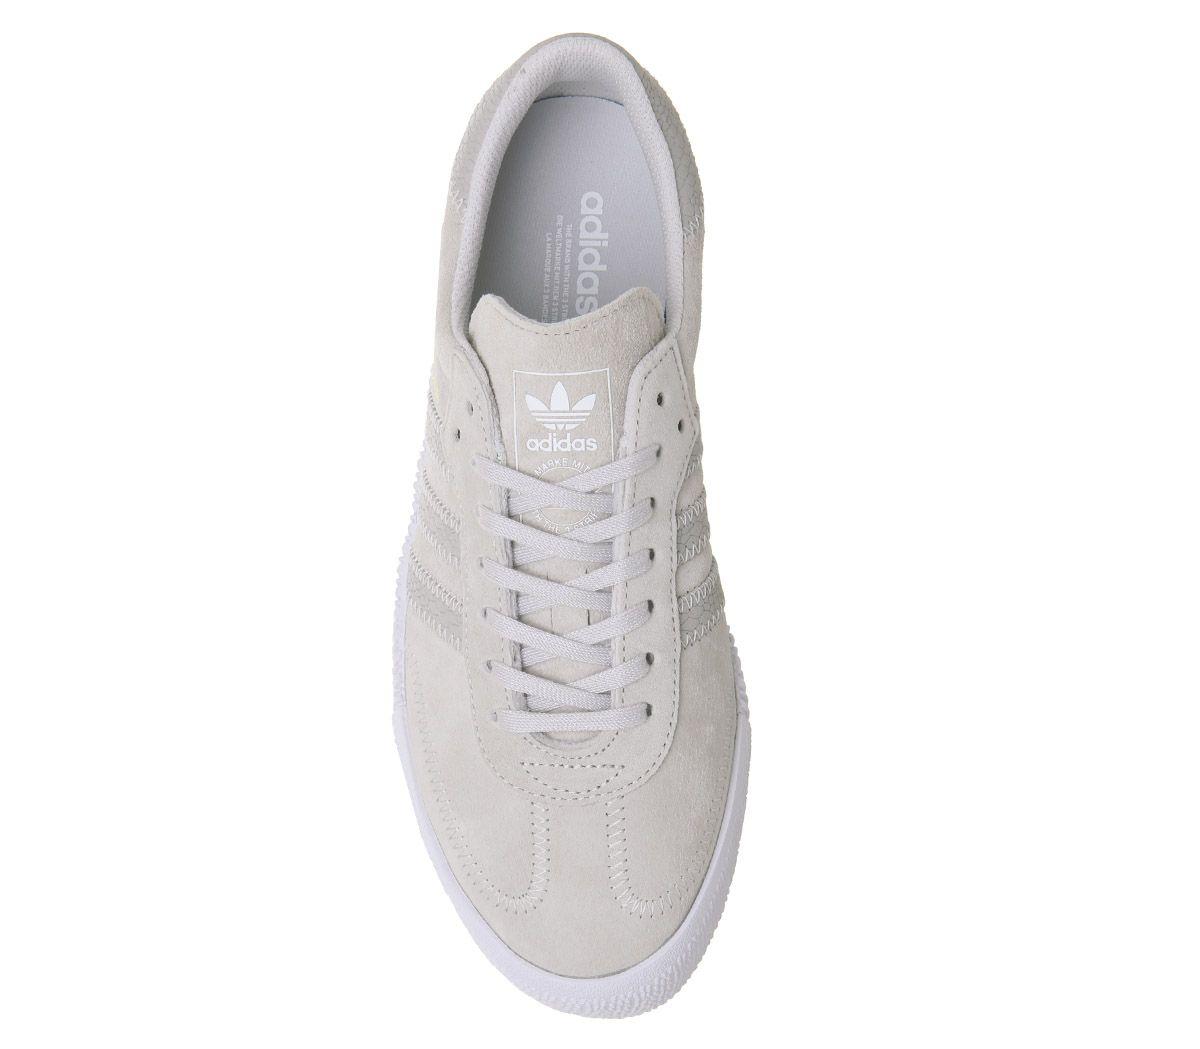 Details zu Damen adidas Samba Rose Turnschuhe Grau One Weiß Turnschuhe